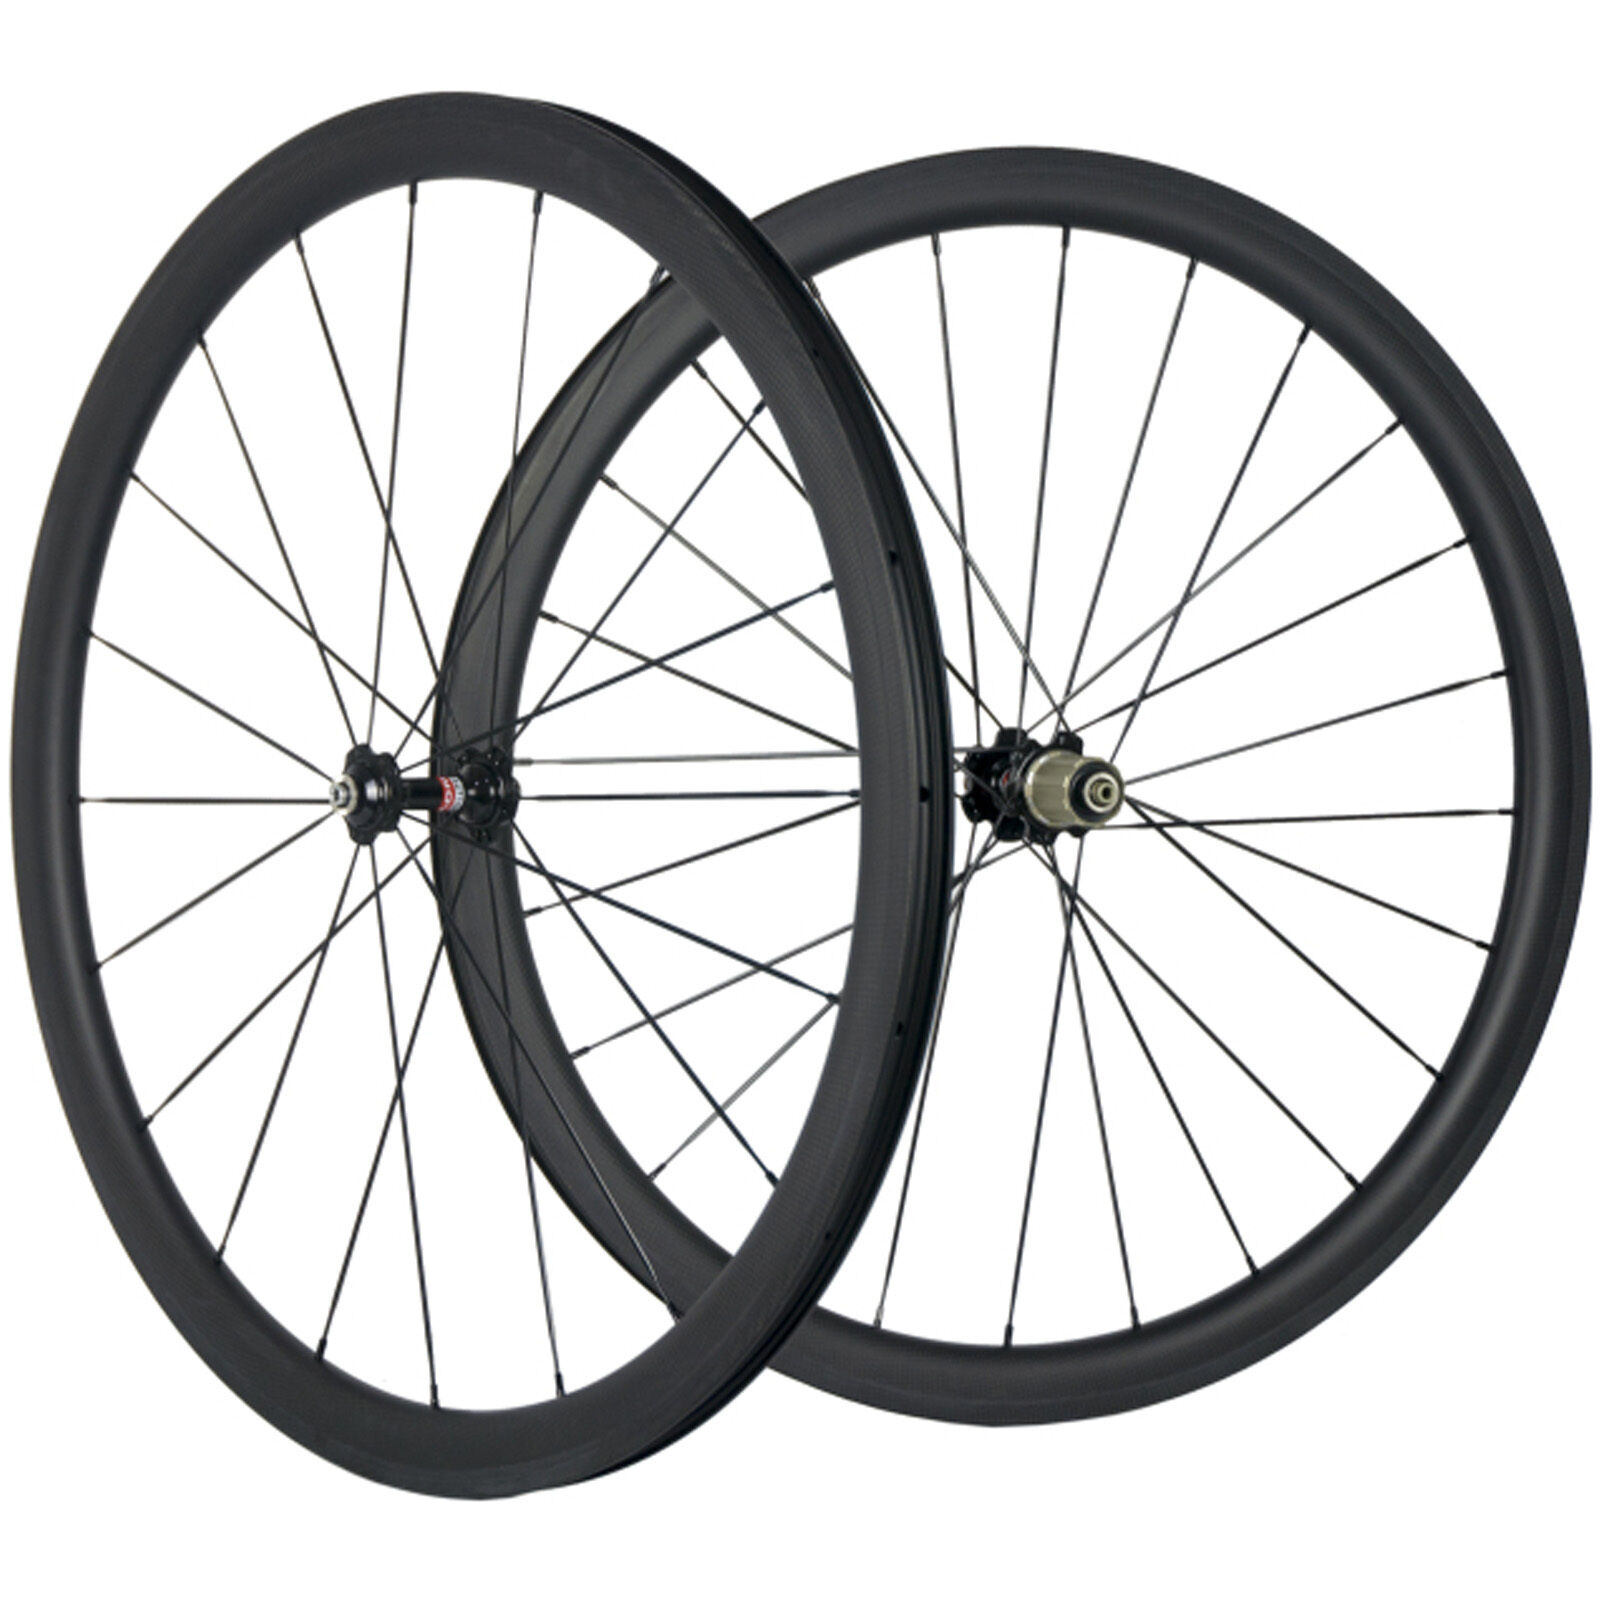 Carbon Road Wheels 38mm Tubeless Carbon Wheelset 25mm Width U Shape Bike Wheel